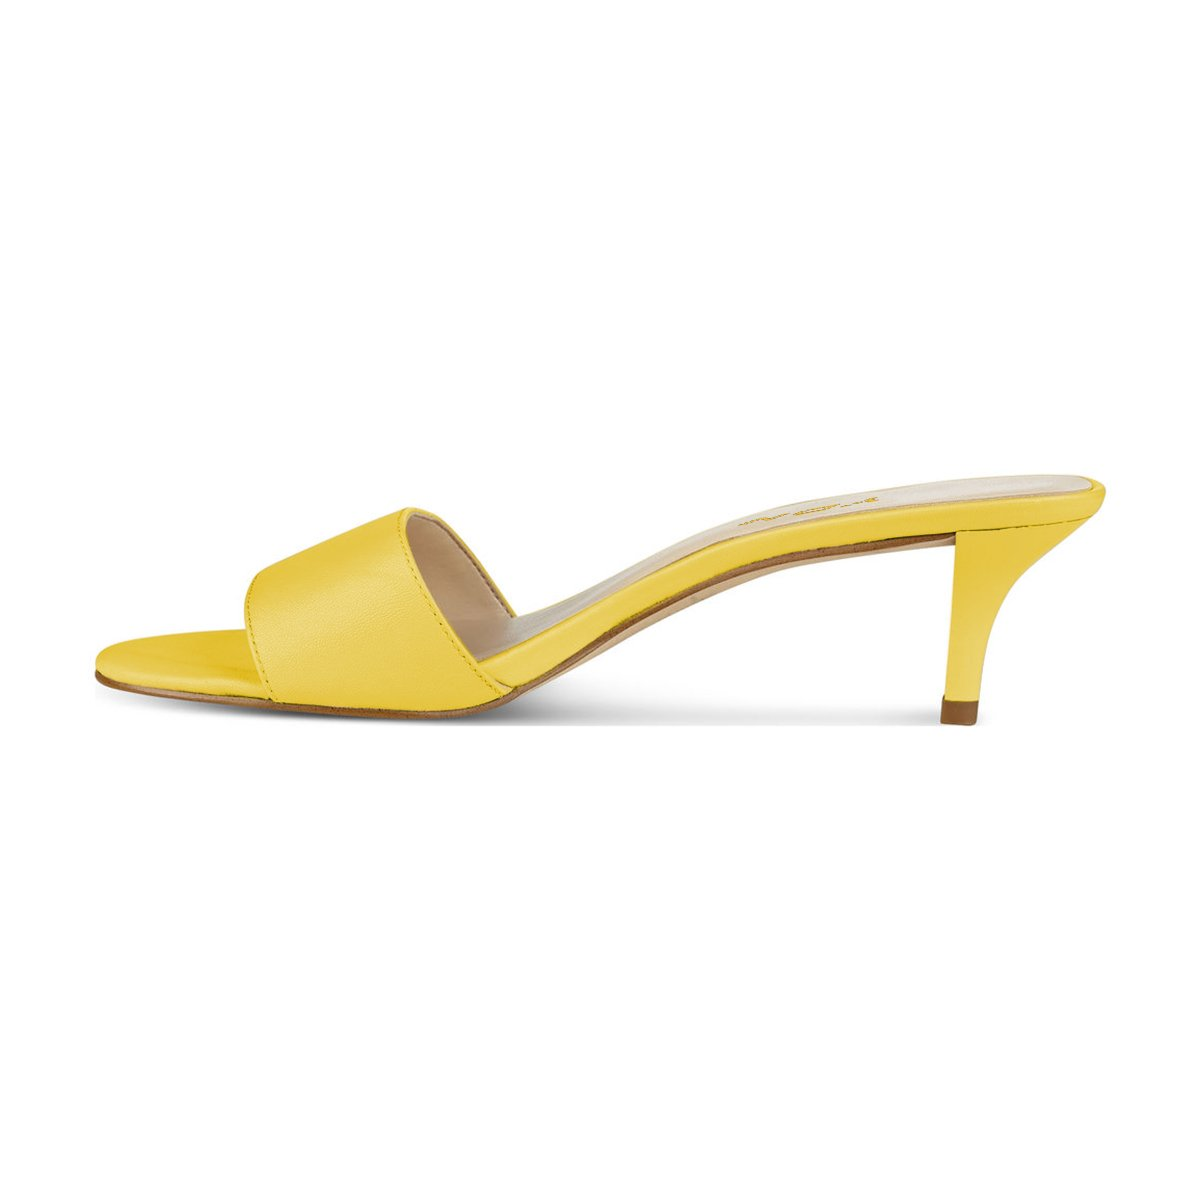 YDN YDN YDN Women Comfy Kitten Low Heel Mules Slip on Clog Sandals Open Toe Dress Pumps Slide Shoes B07BKWLYZN 9 M US Yellow-5cm 1df17e